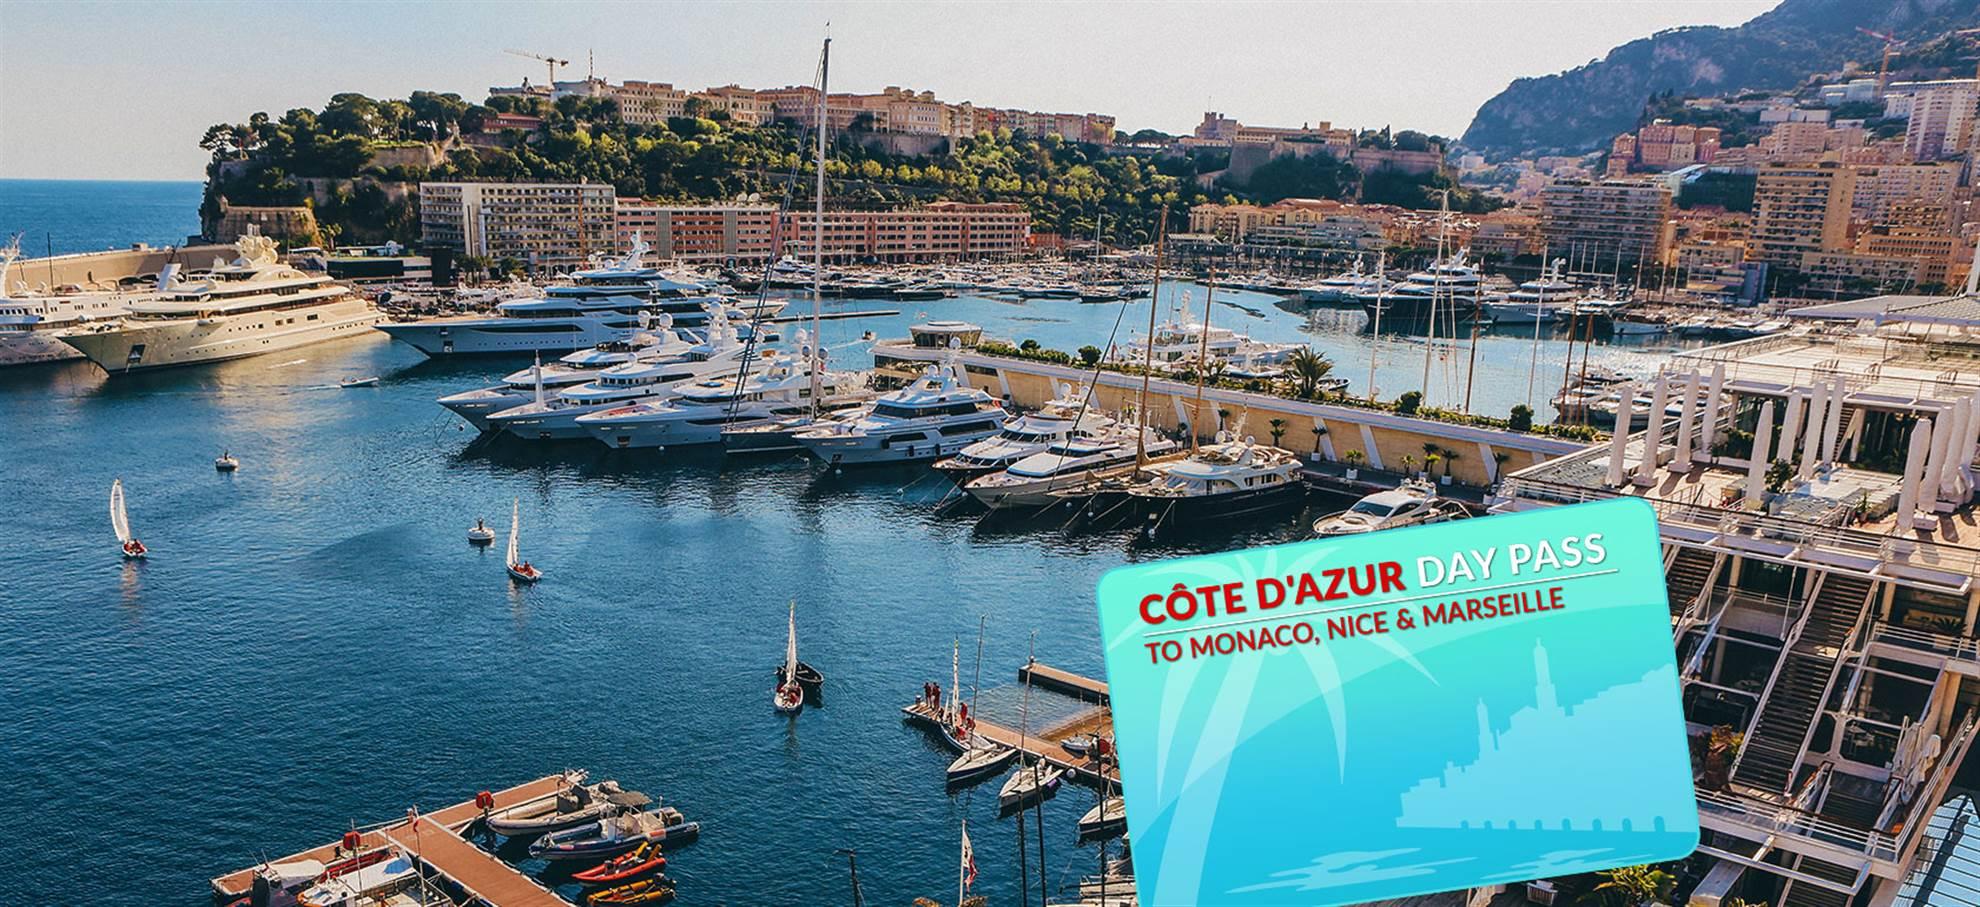 Côte d'Azur Day Pass to Marseille/Nice/Monaco